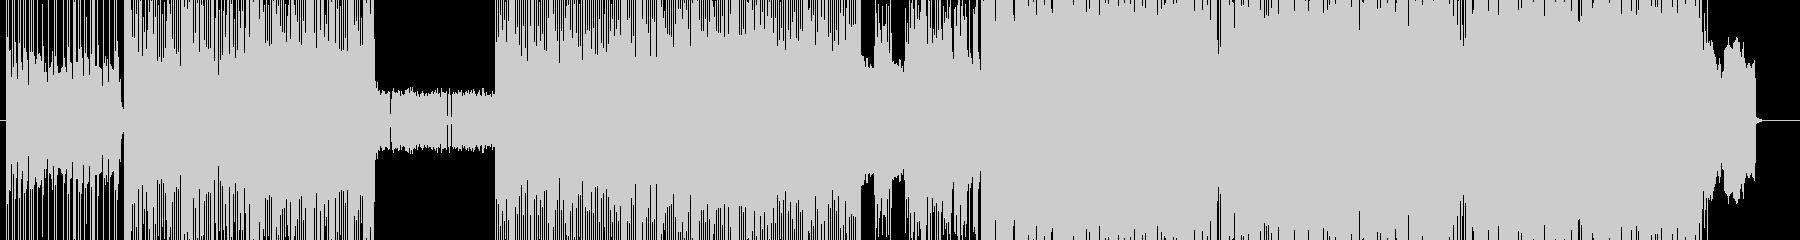 「HR/HM/DARK」BGM29の未再生の波形